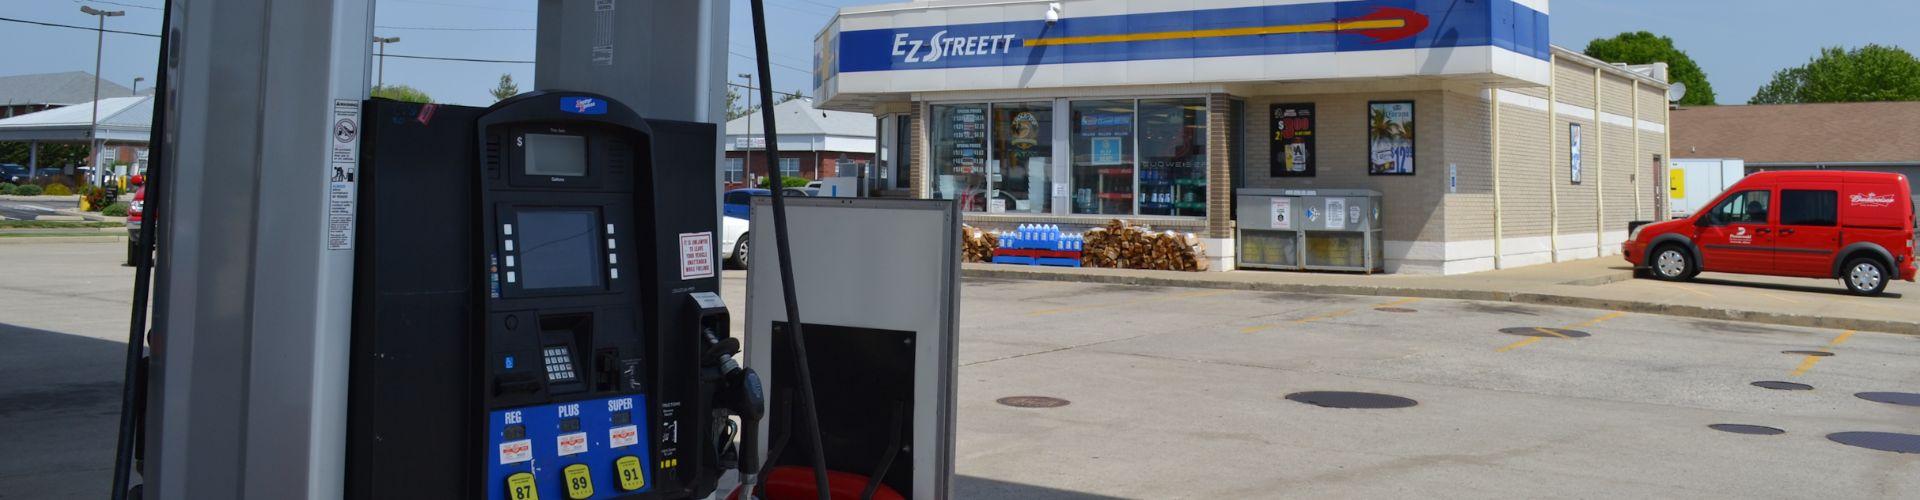 gas-pump-c-store